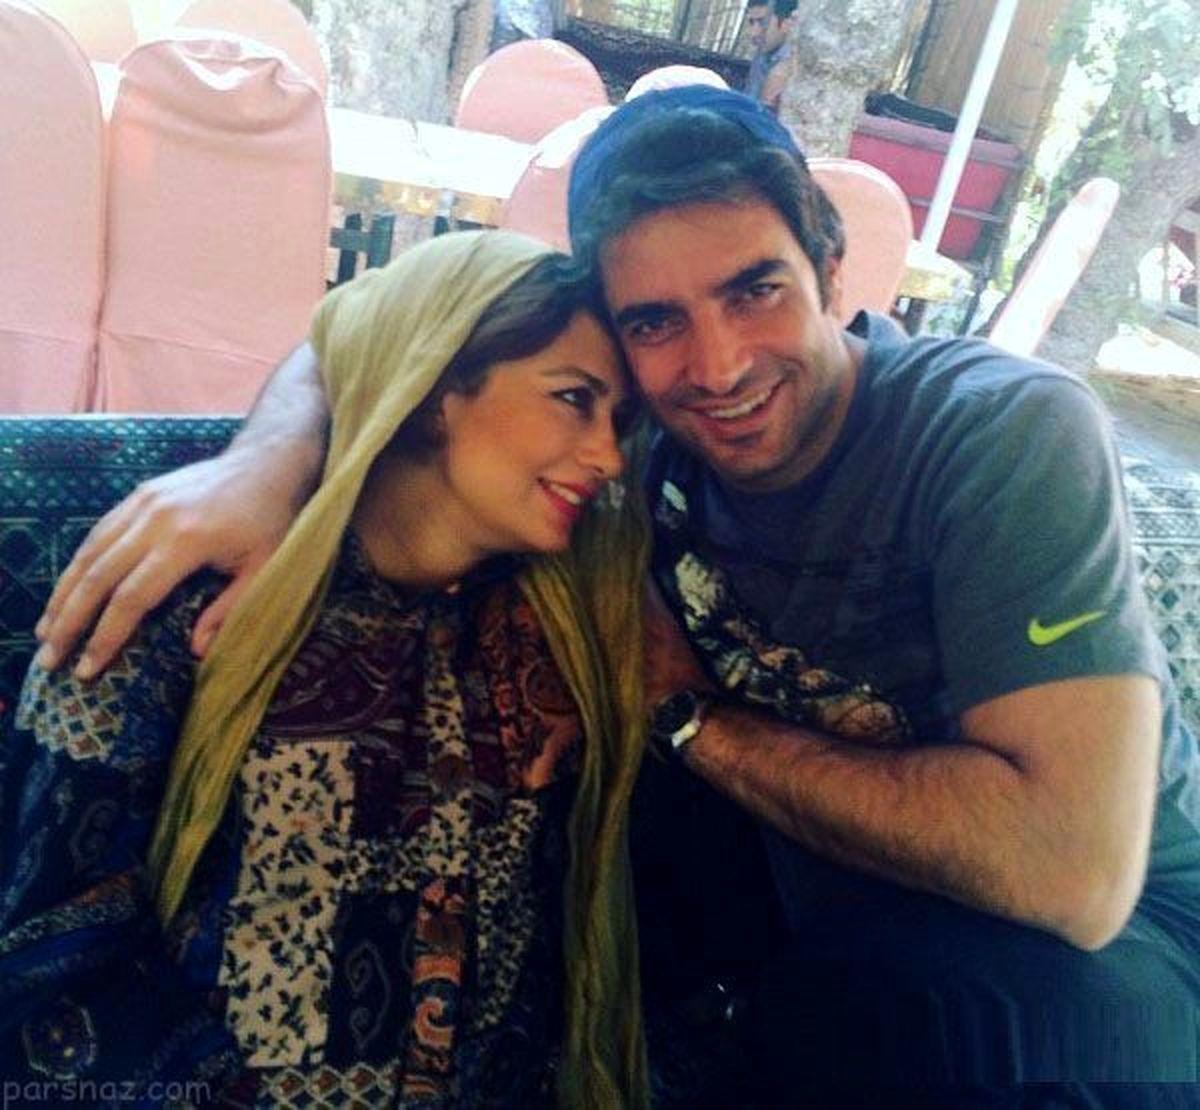 عکس عاشقانه یکتا ناصر و همسرش در مهمانی خصوصی بازیگران + عکس